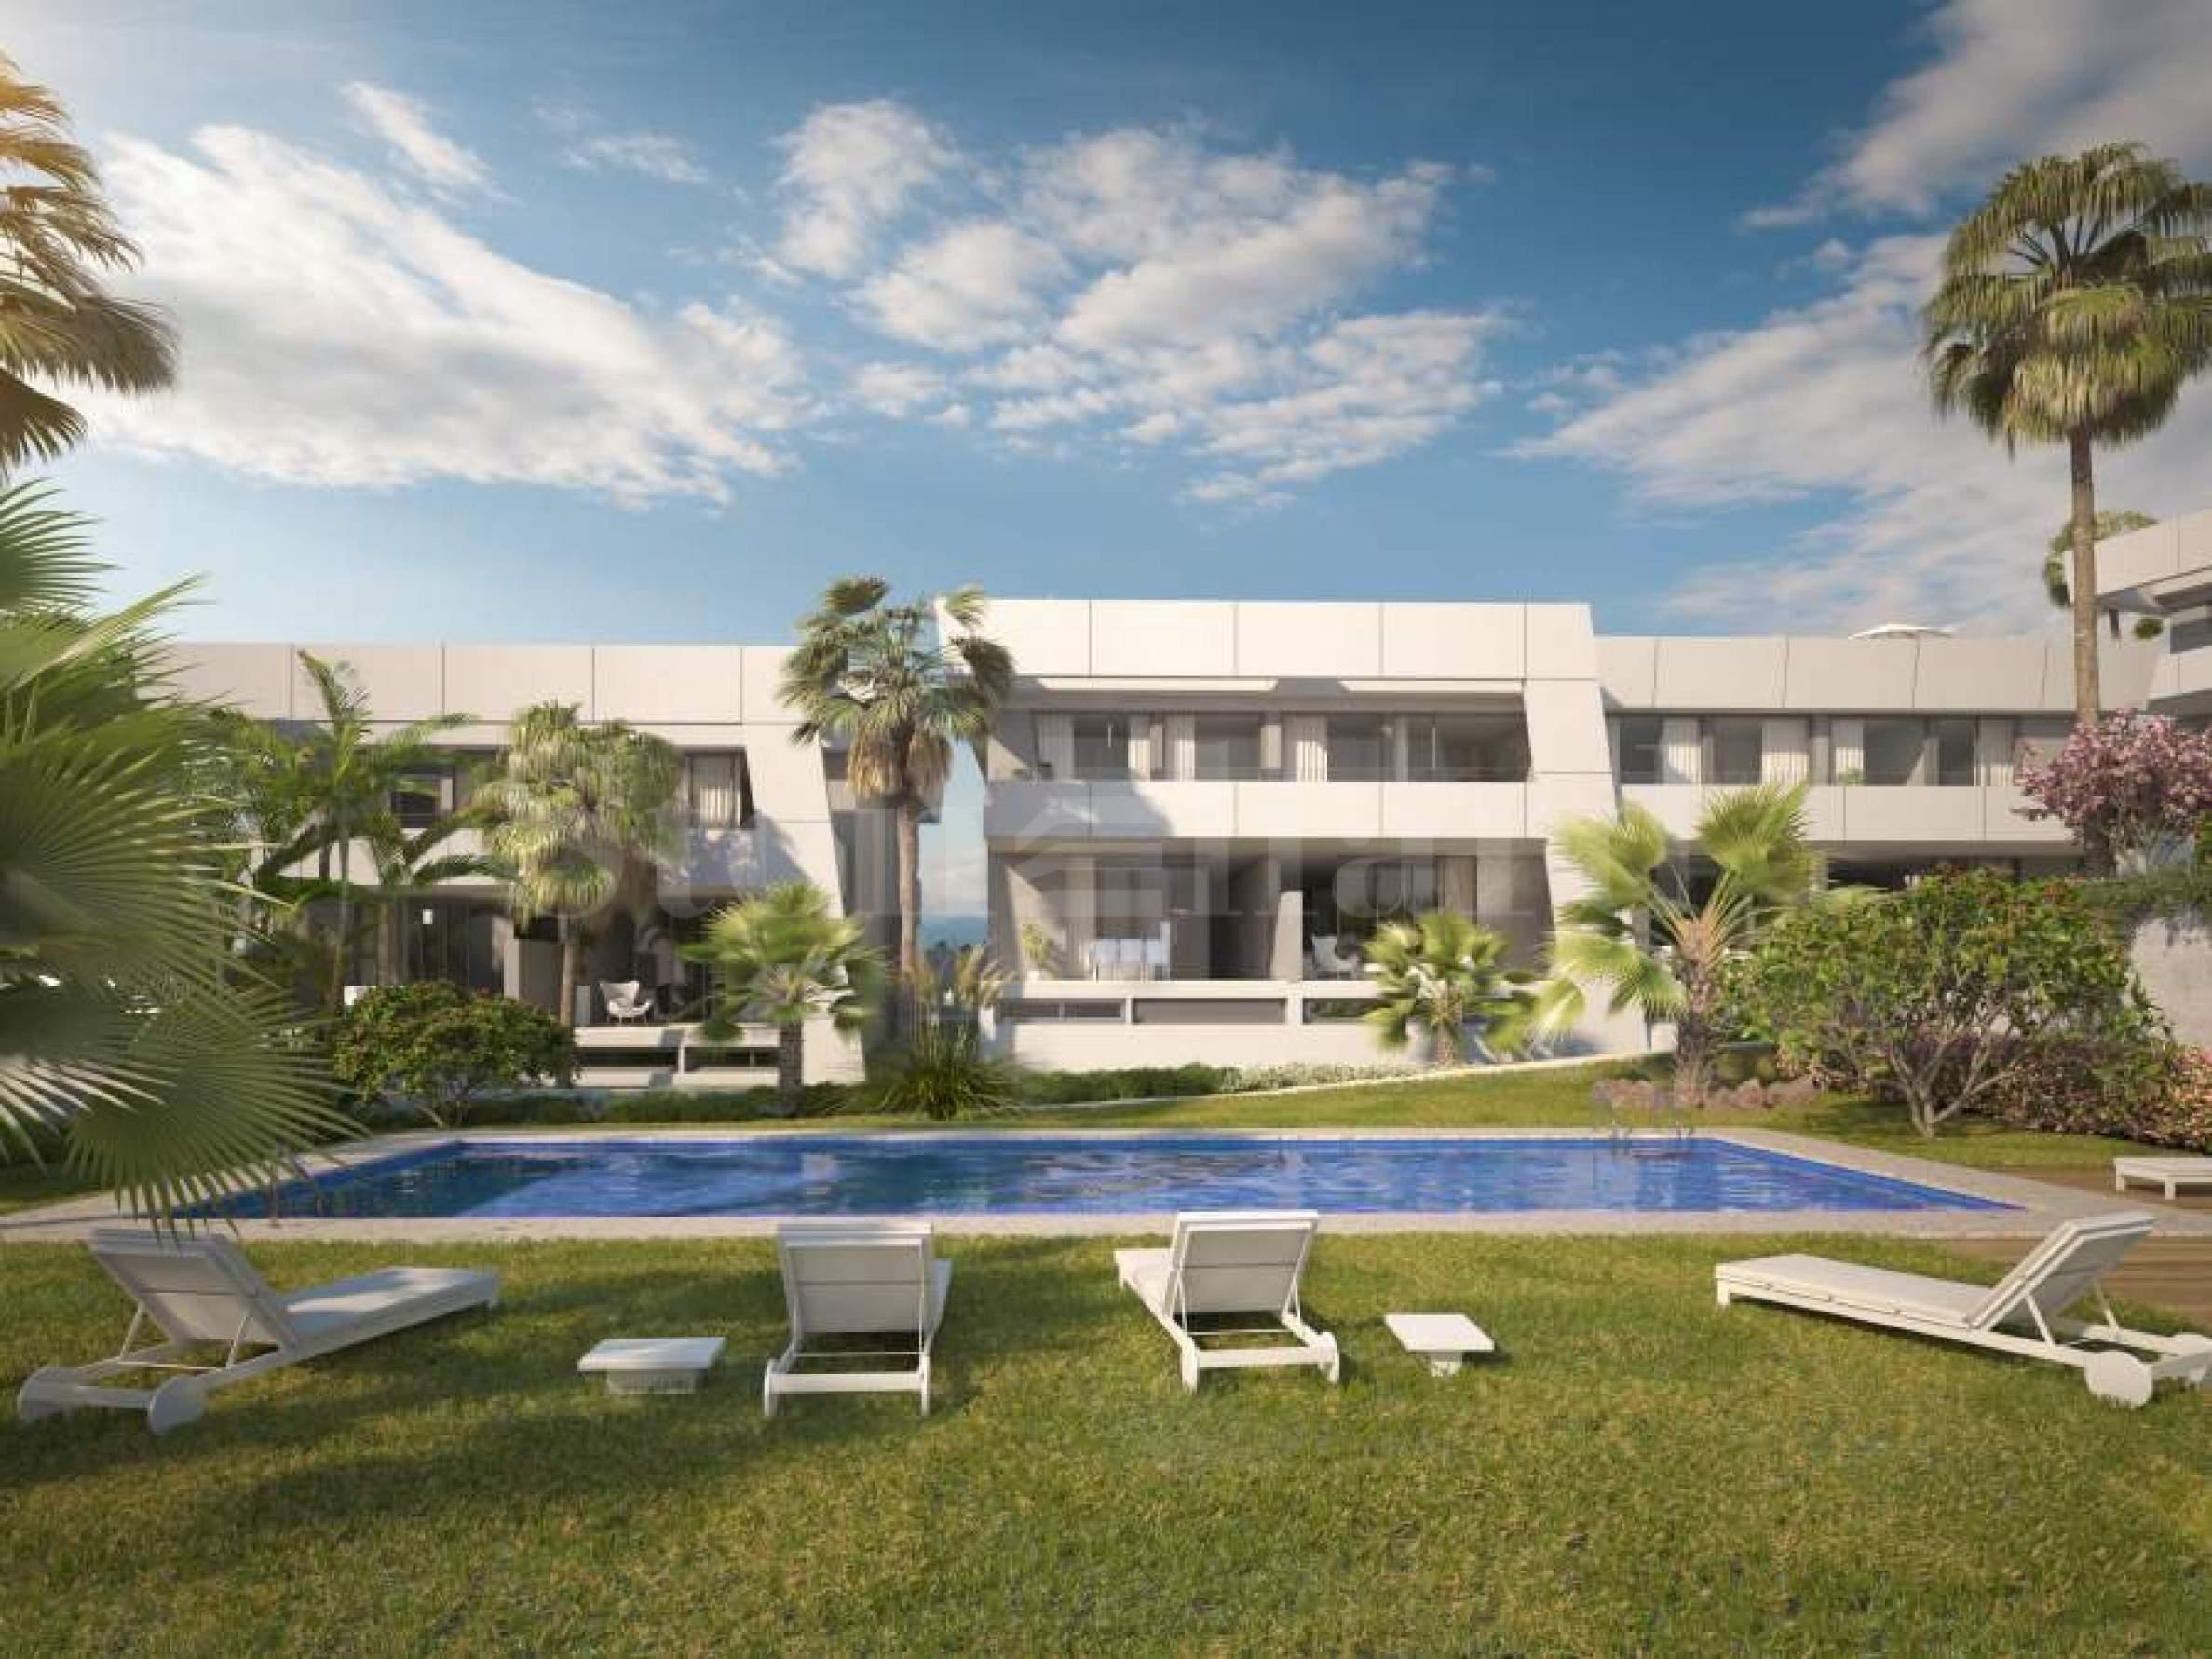 Townhouses with cutting edge design near Marbella1 - Stonehard